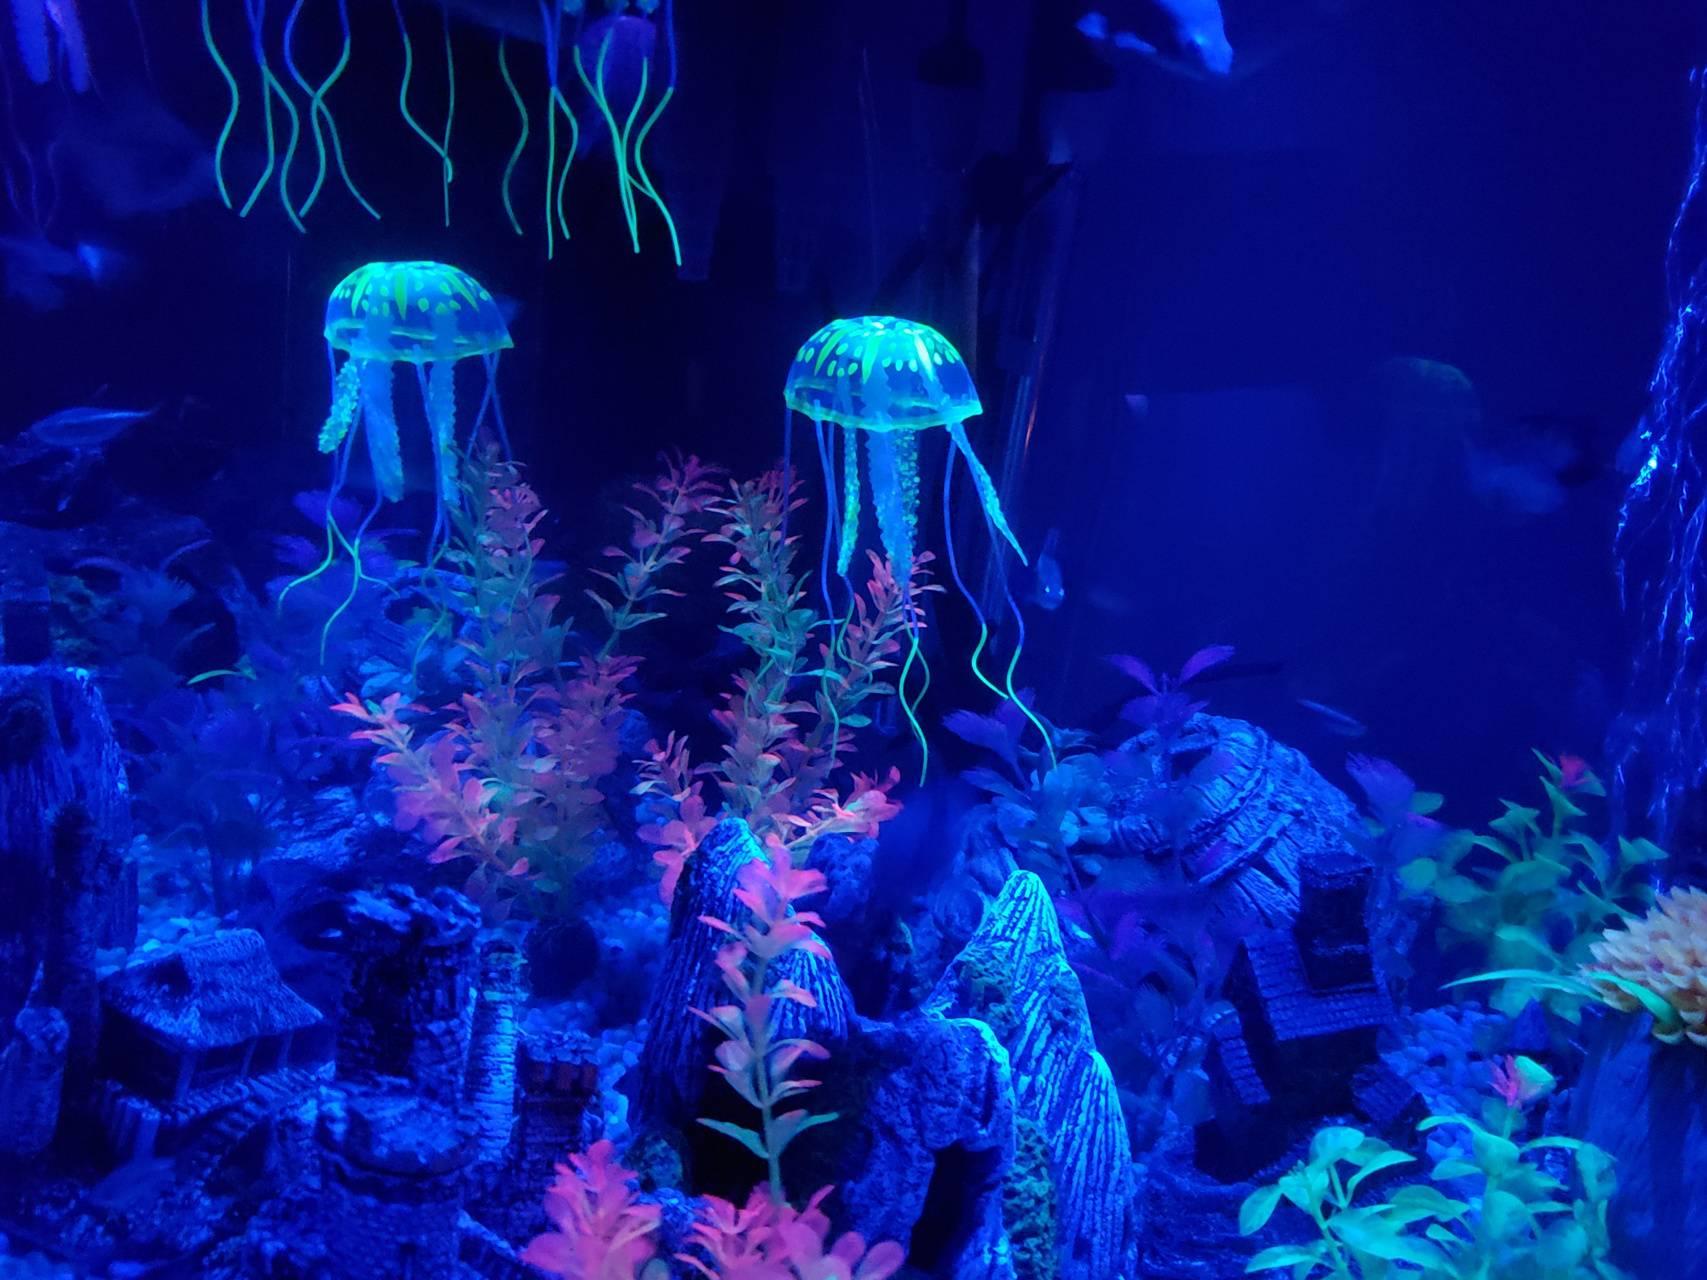 Imitation jellyfish